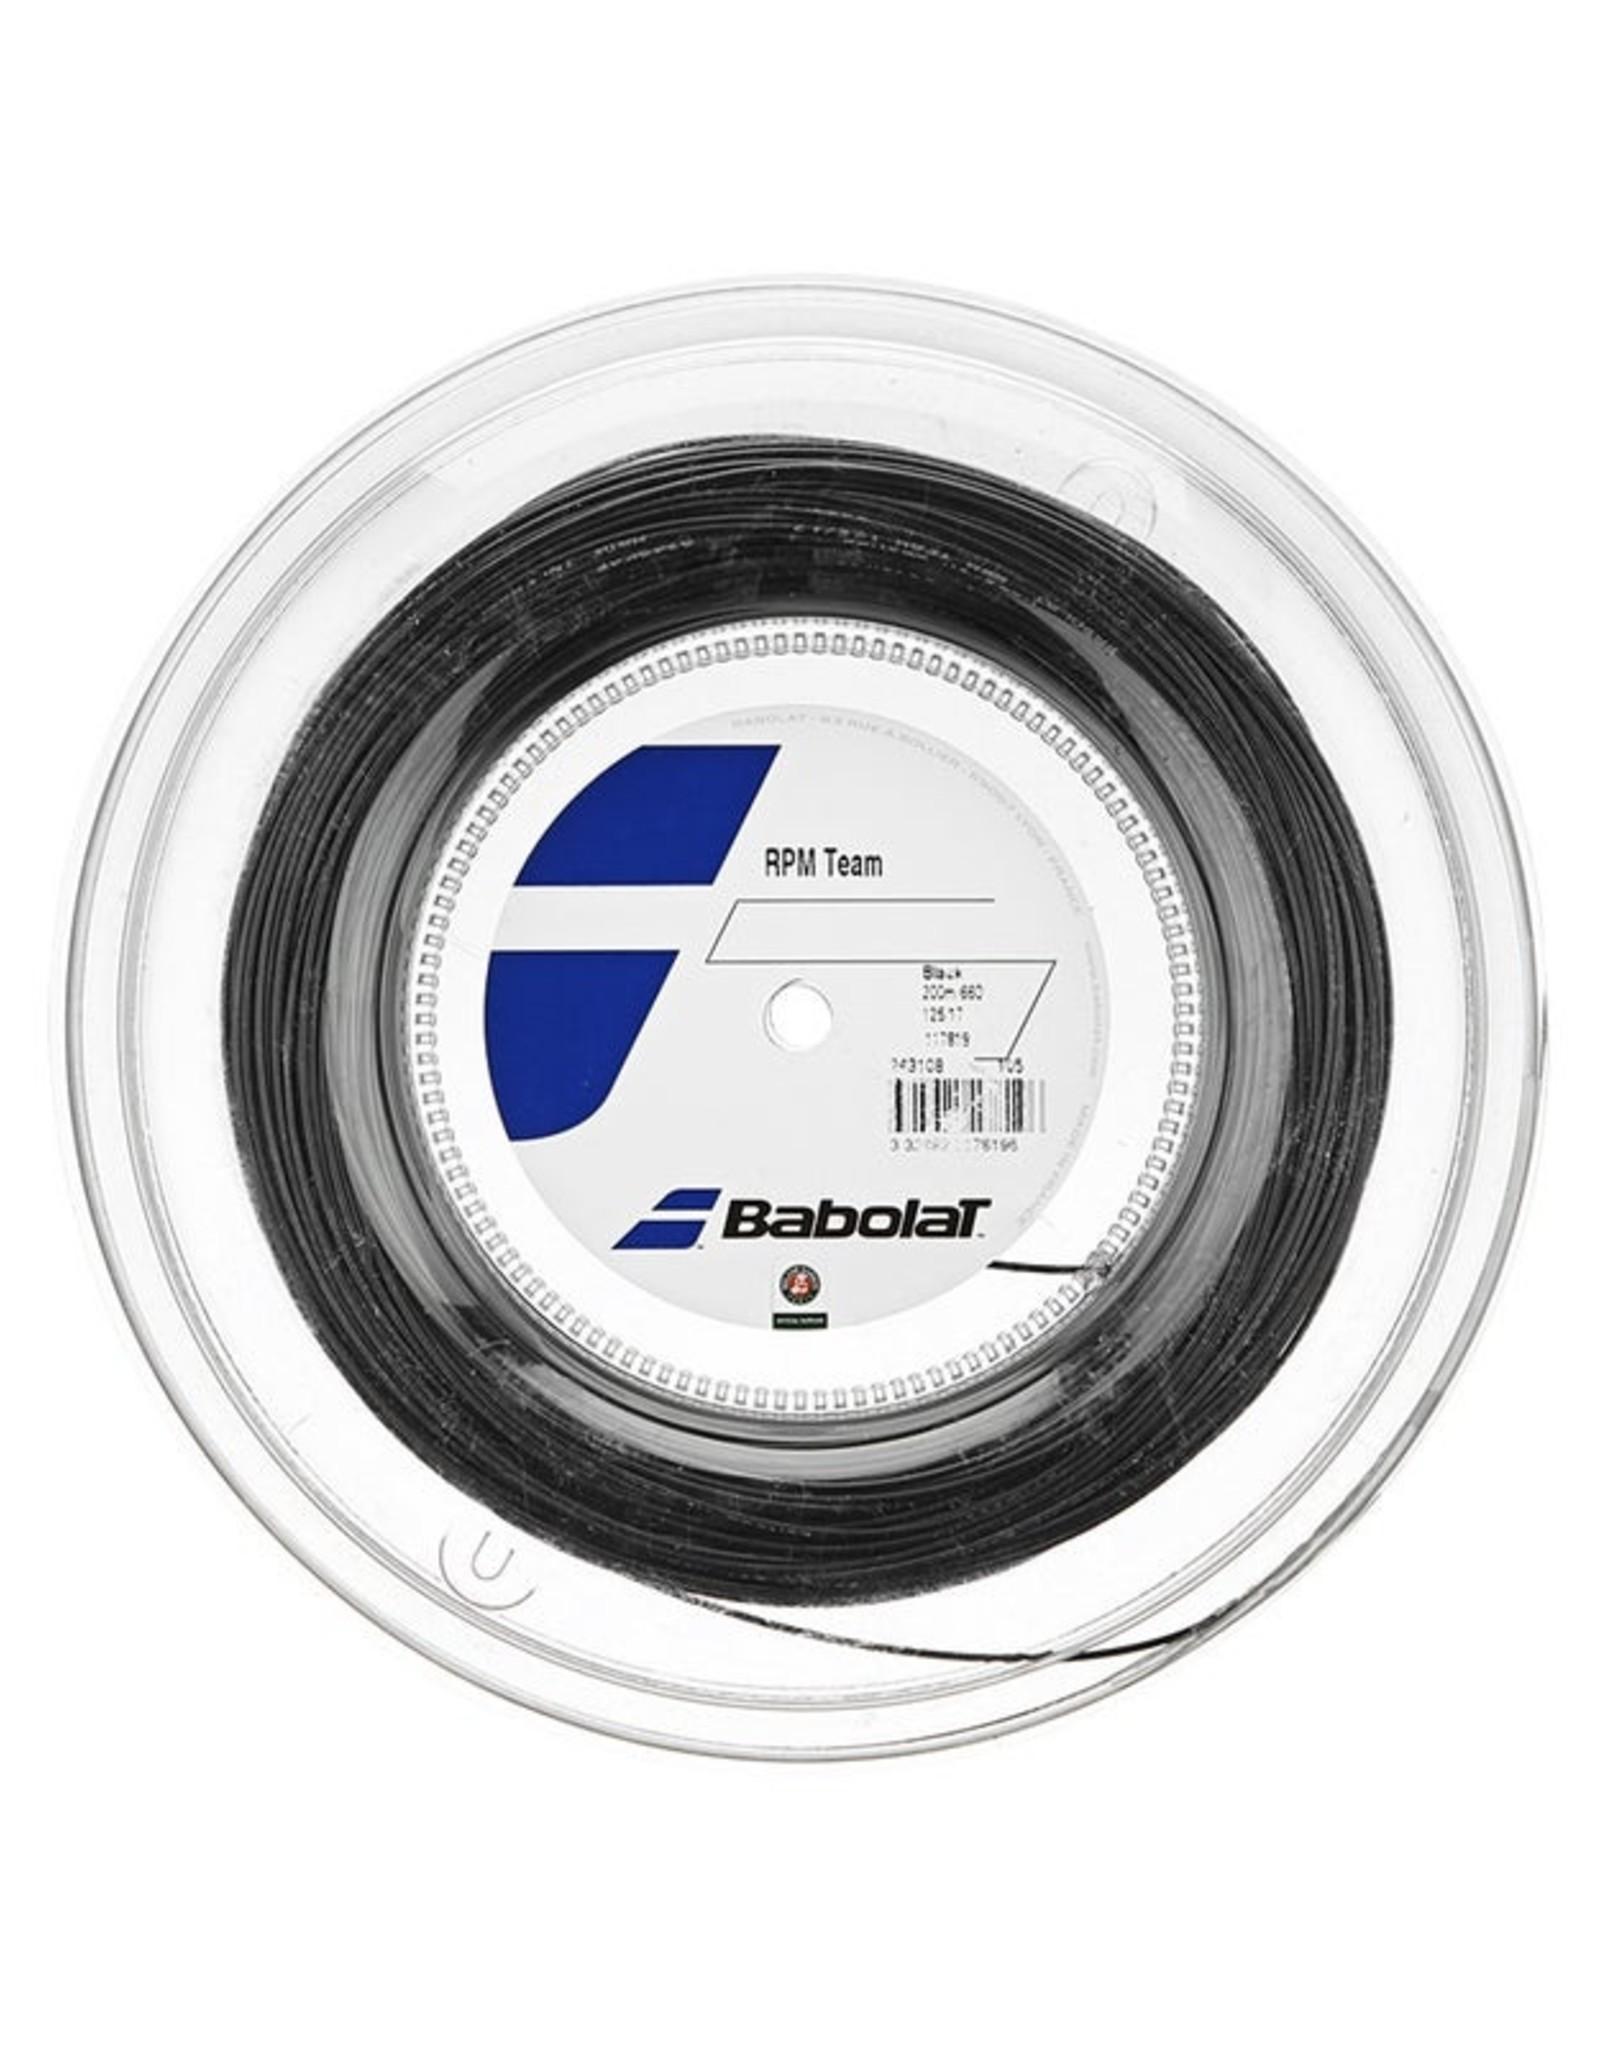 Babolat Babolat RPM Team Reel